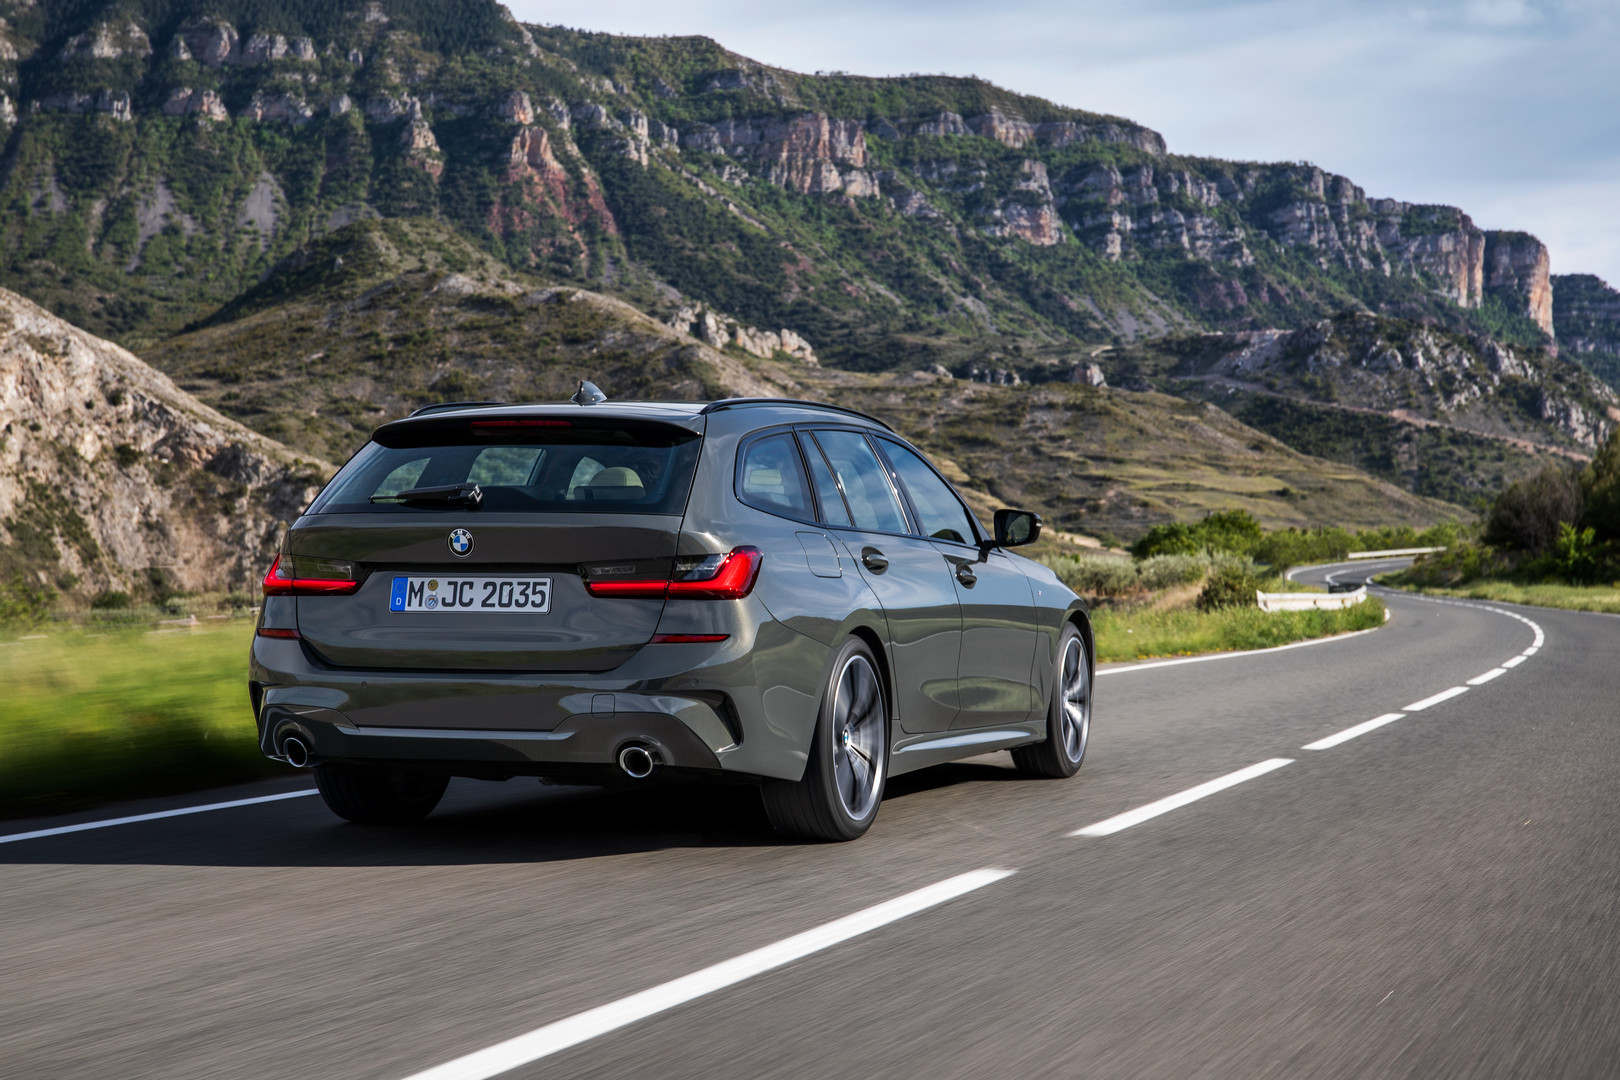 2020 BMW 3 Series Touring Rear View